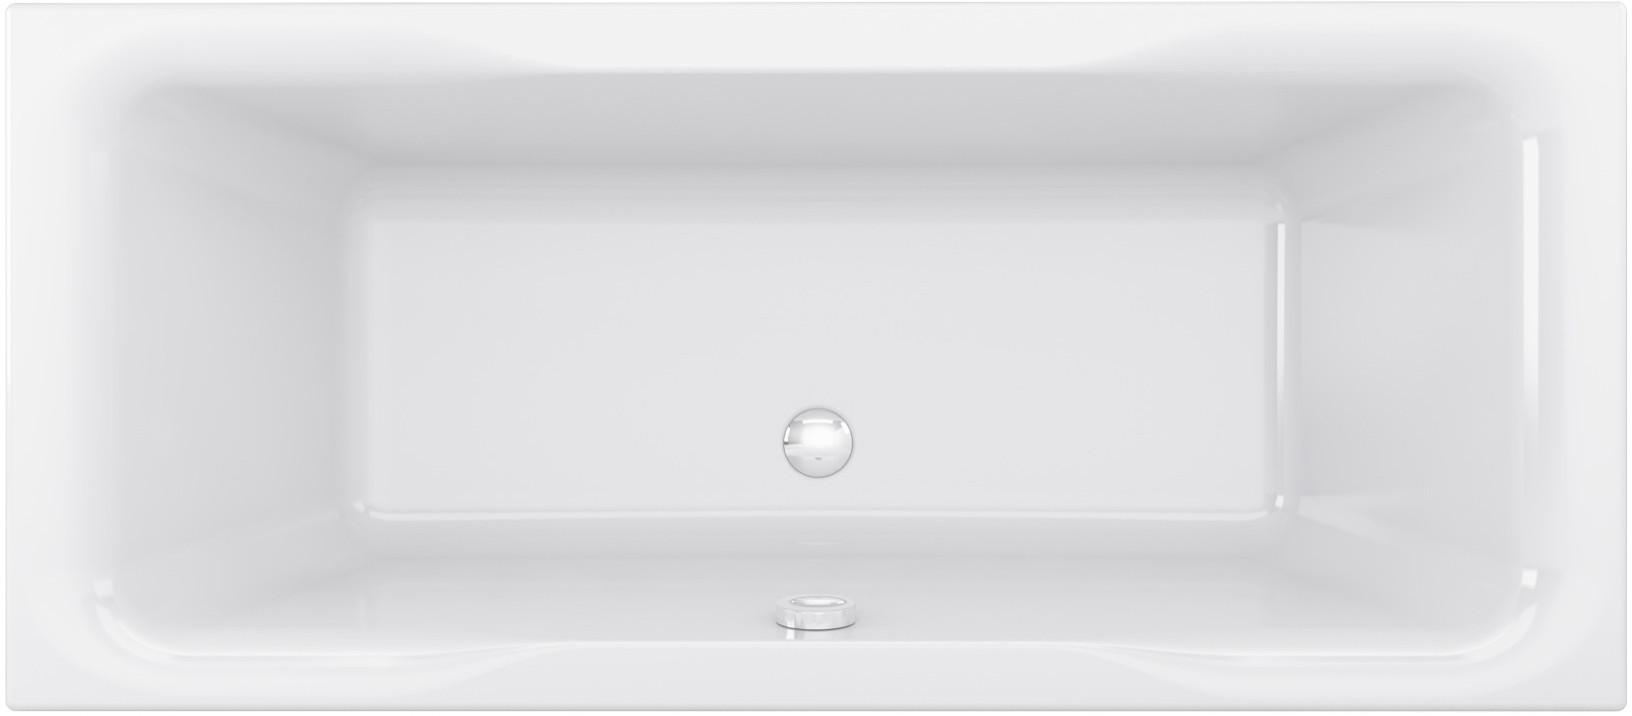 badewanne rechteck acryl 140x70 150x70 160x70 170x70 wanne ablauf pure wt. Black Bedroom Furniture Sets. Home Design Ideas